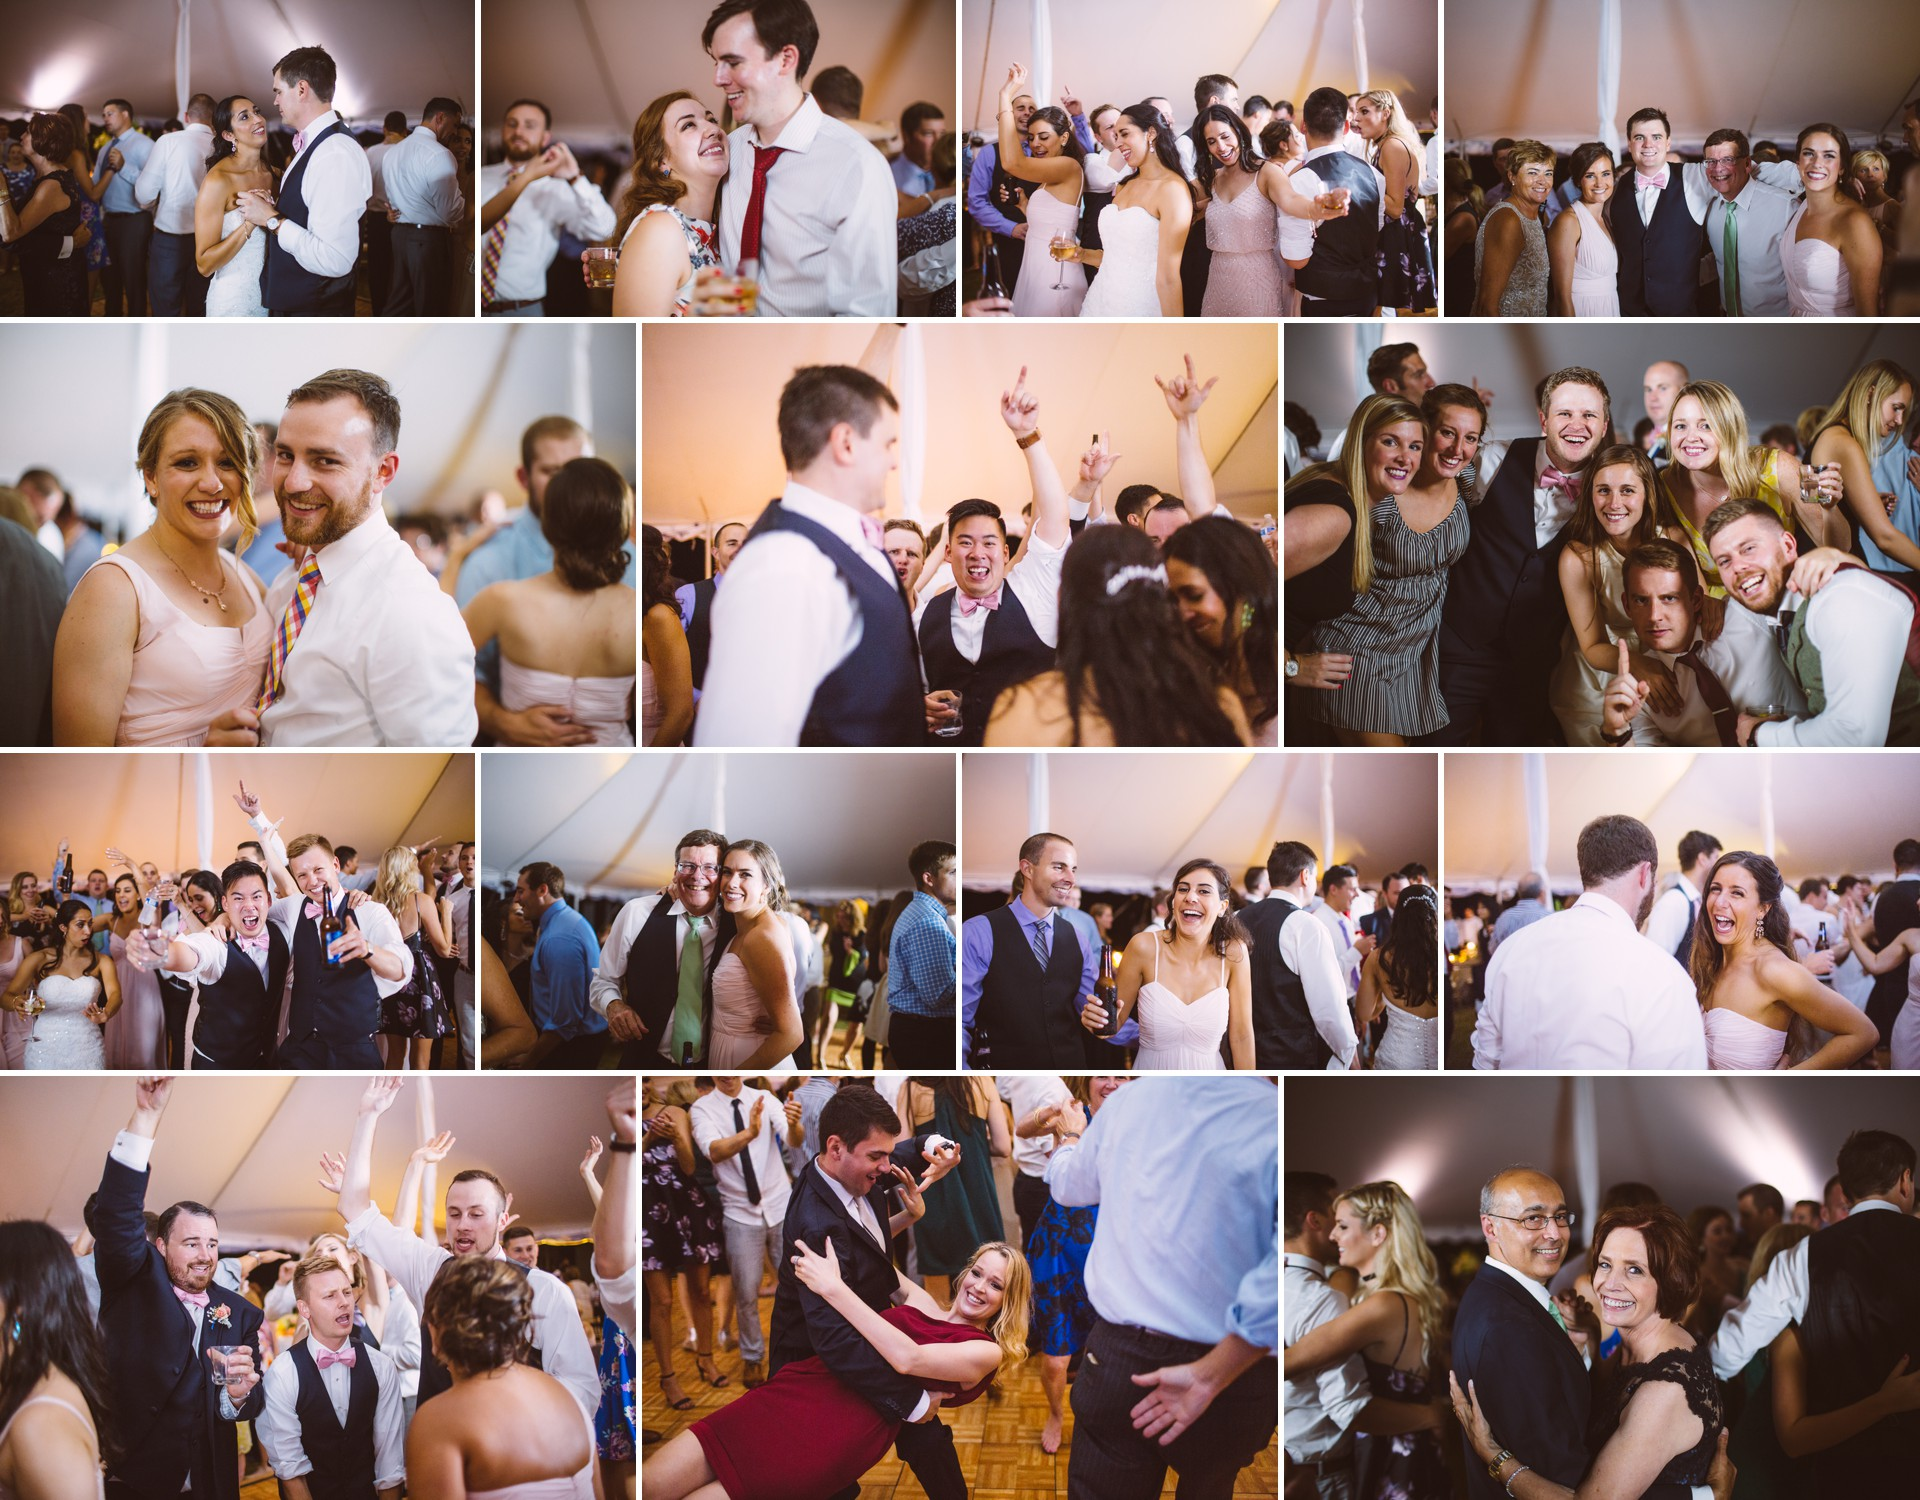 Bolton House Wedding Photographer in Beachwood 82.jpg